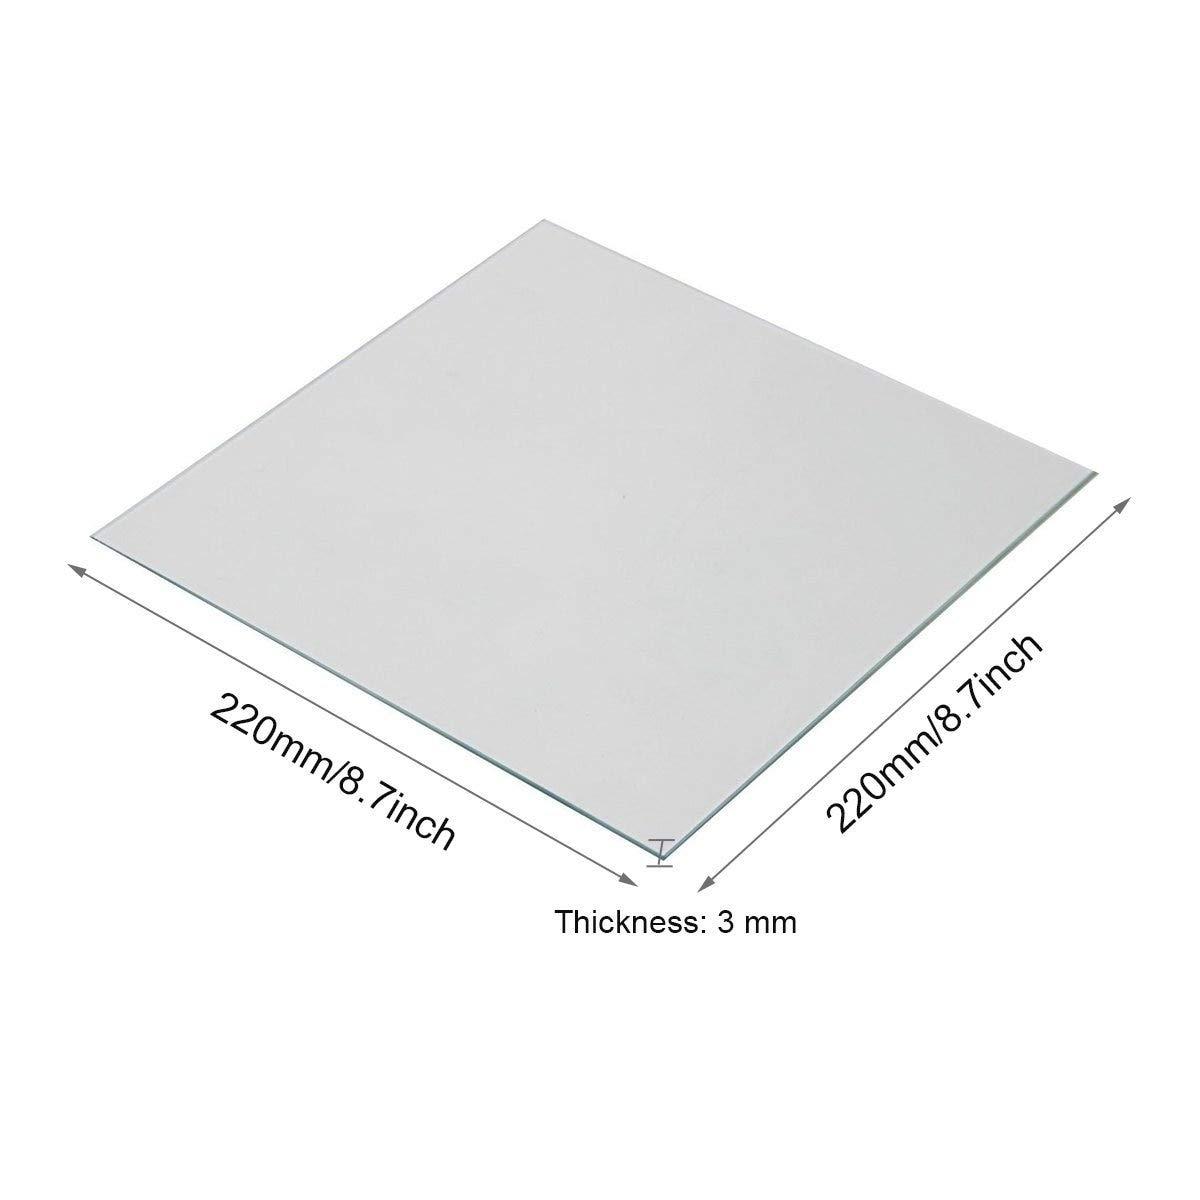 Impresora 3D - Placa de vidrio de borosilicato 220 x 220 x 3 mm ...